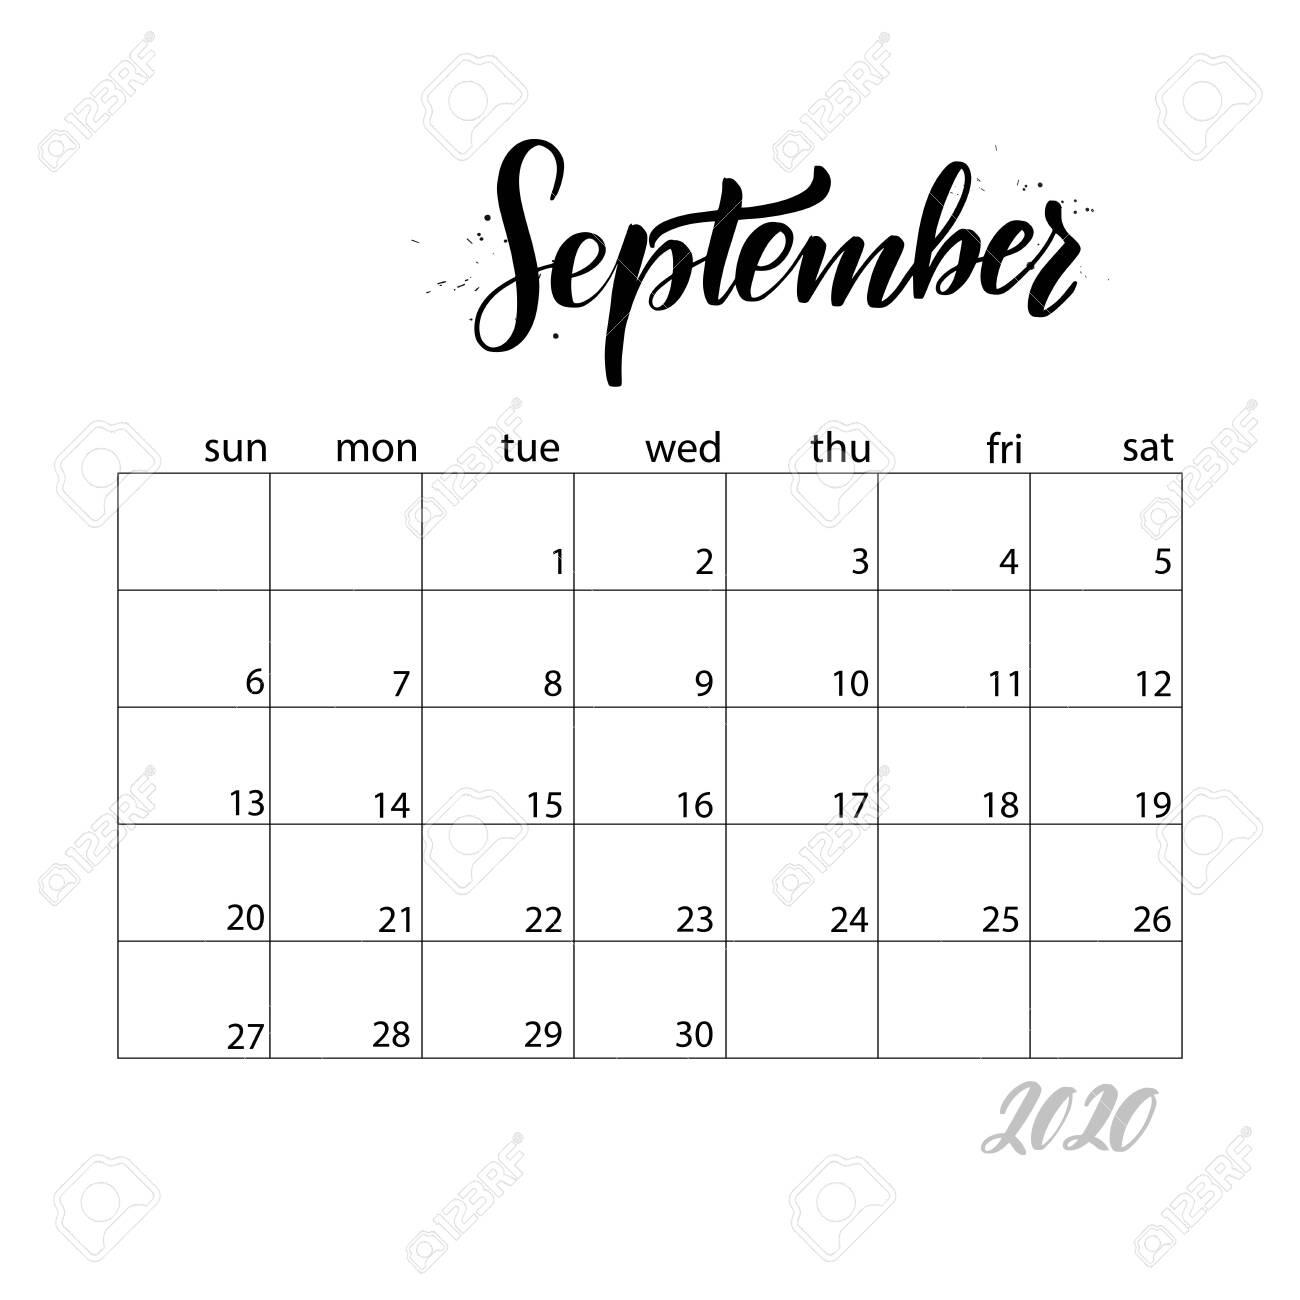 September. Monthly Calendar For 2020 Year. Handwritten Modern..